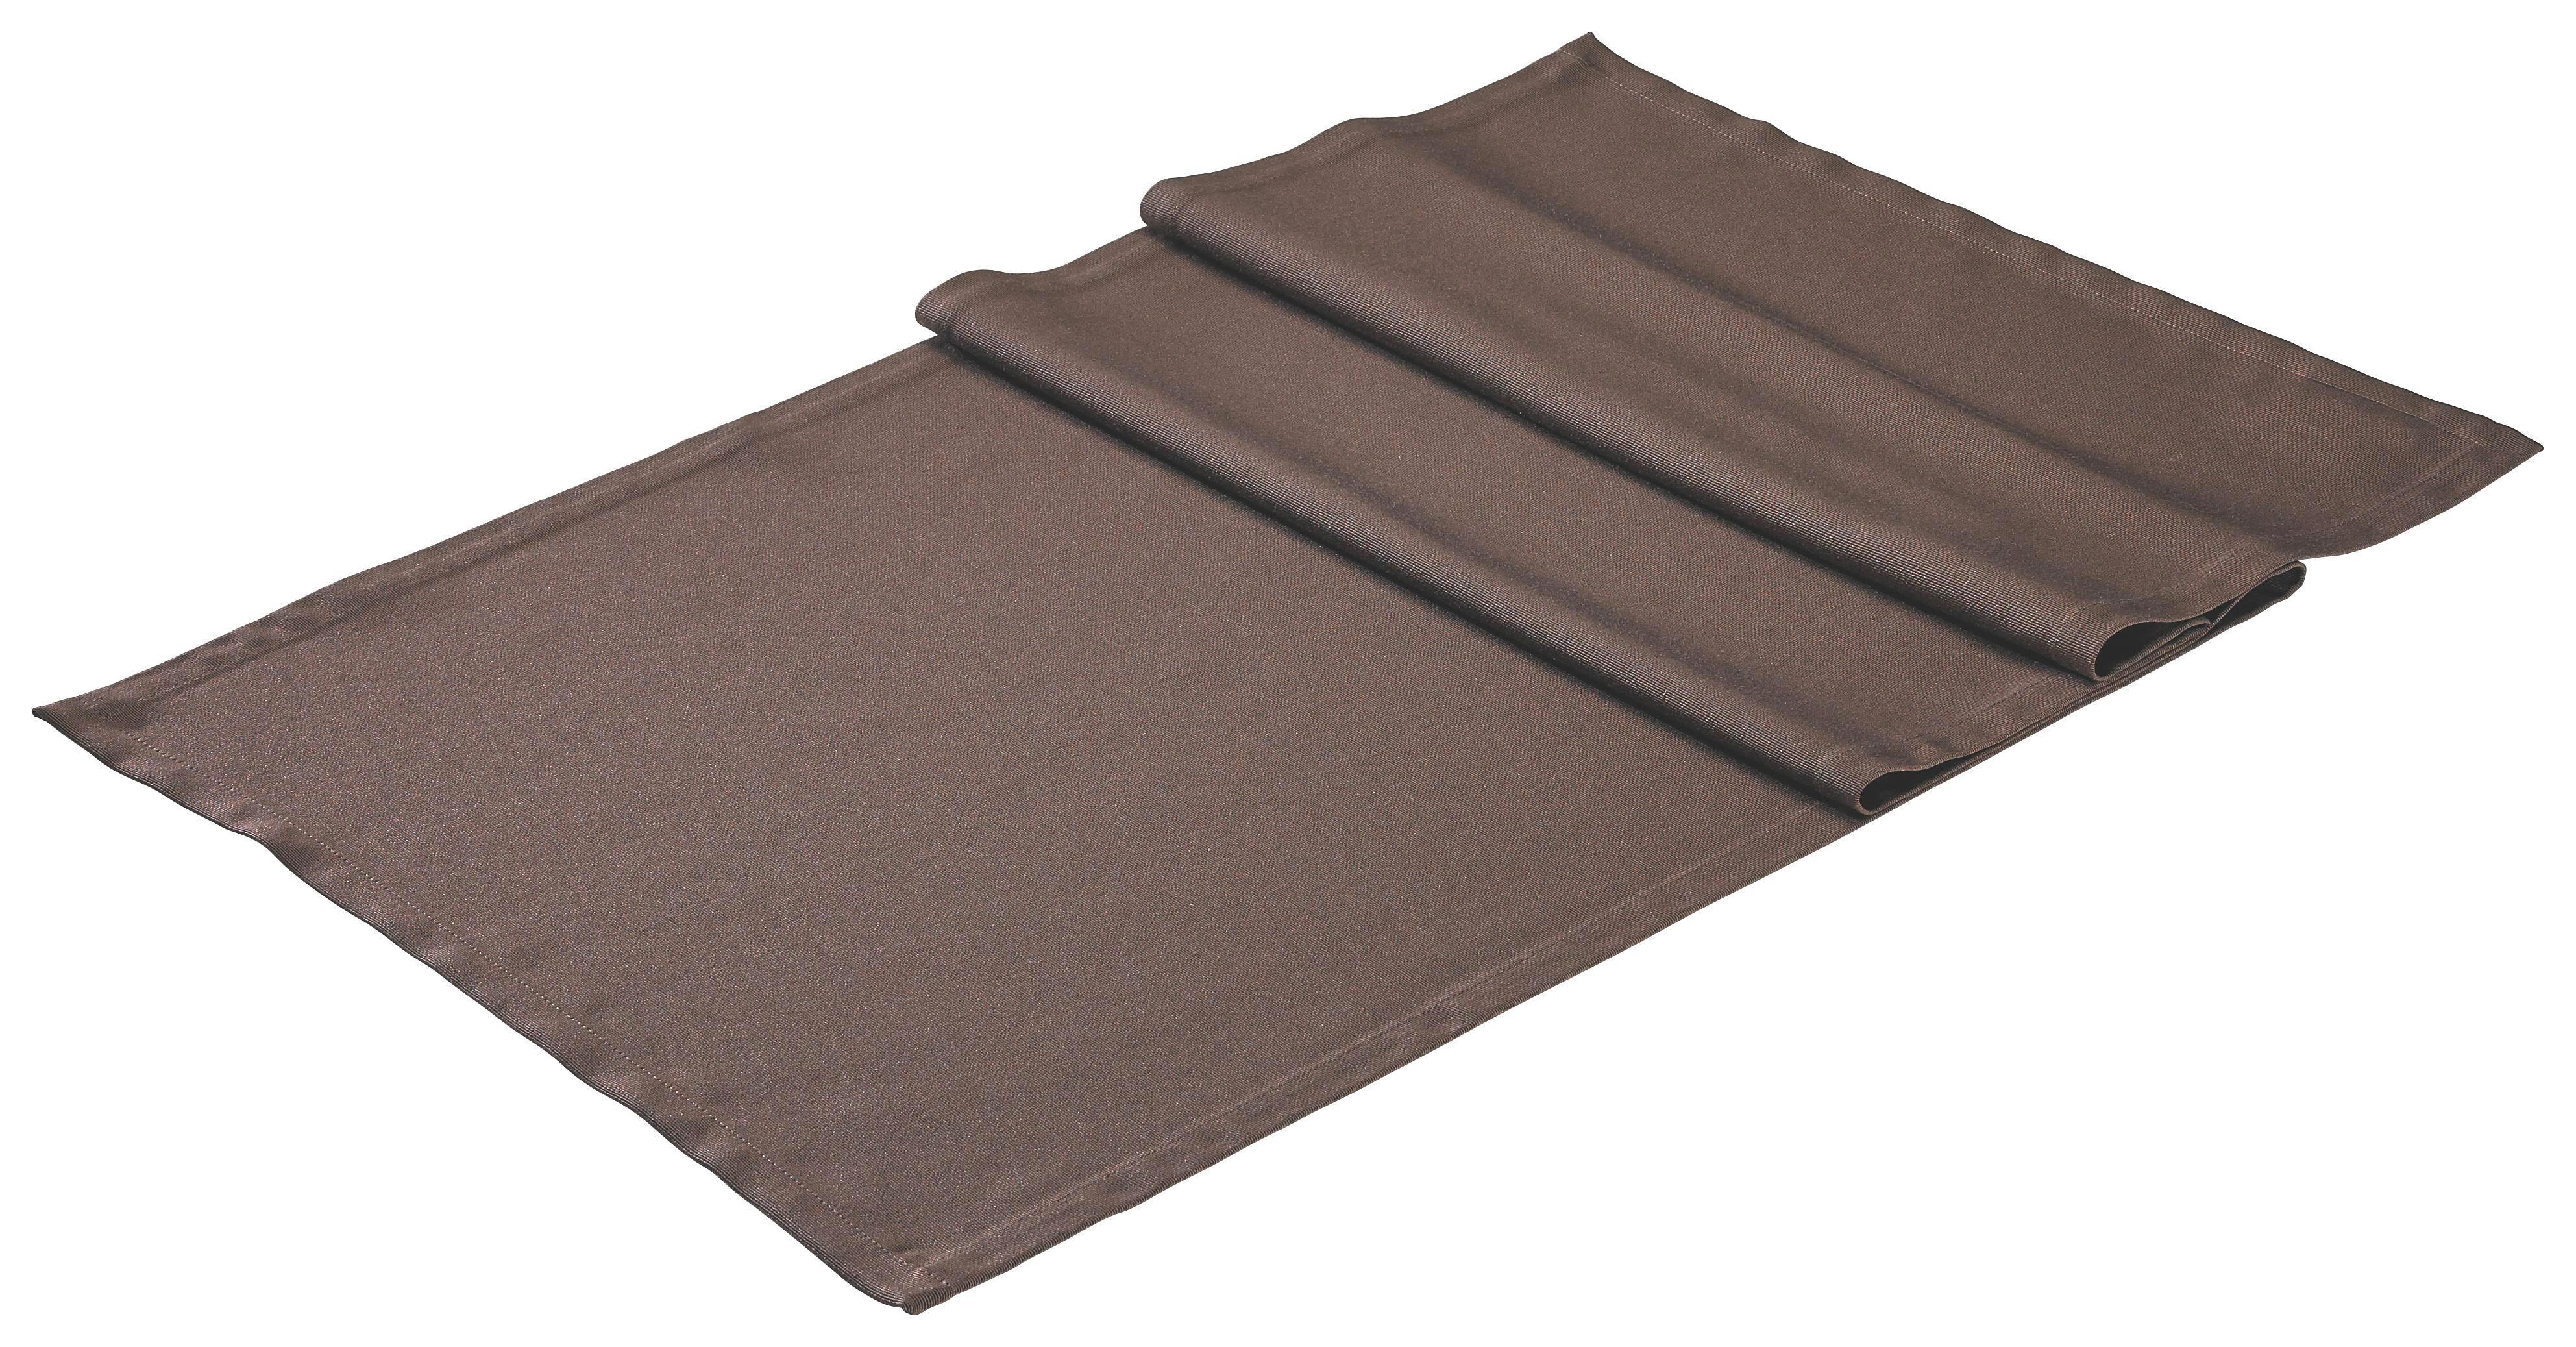 TISCHLÄUFER Textil Braun 50/150 cm - Braun, Basics, Textil (50/150cm)